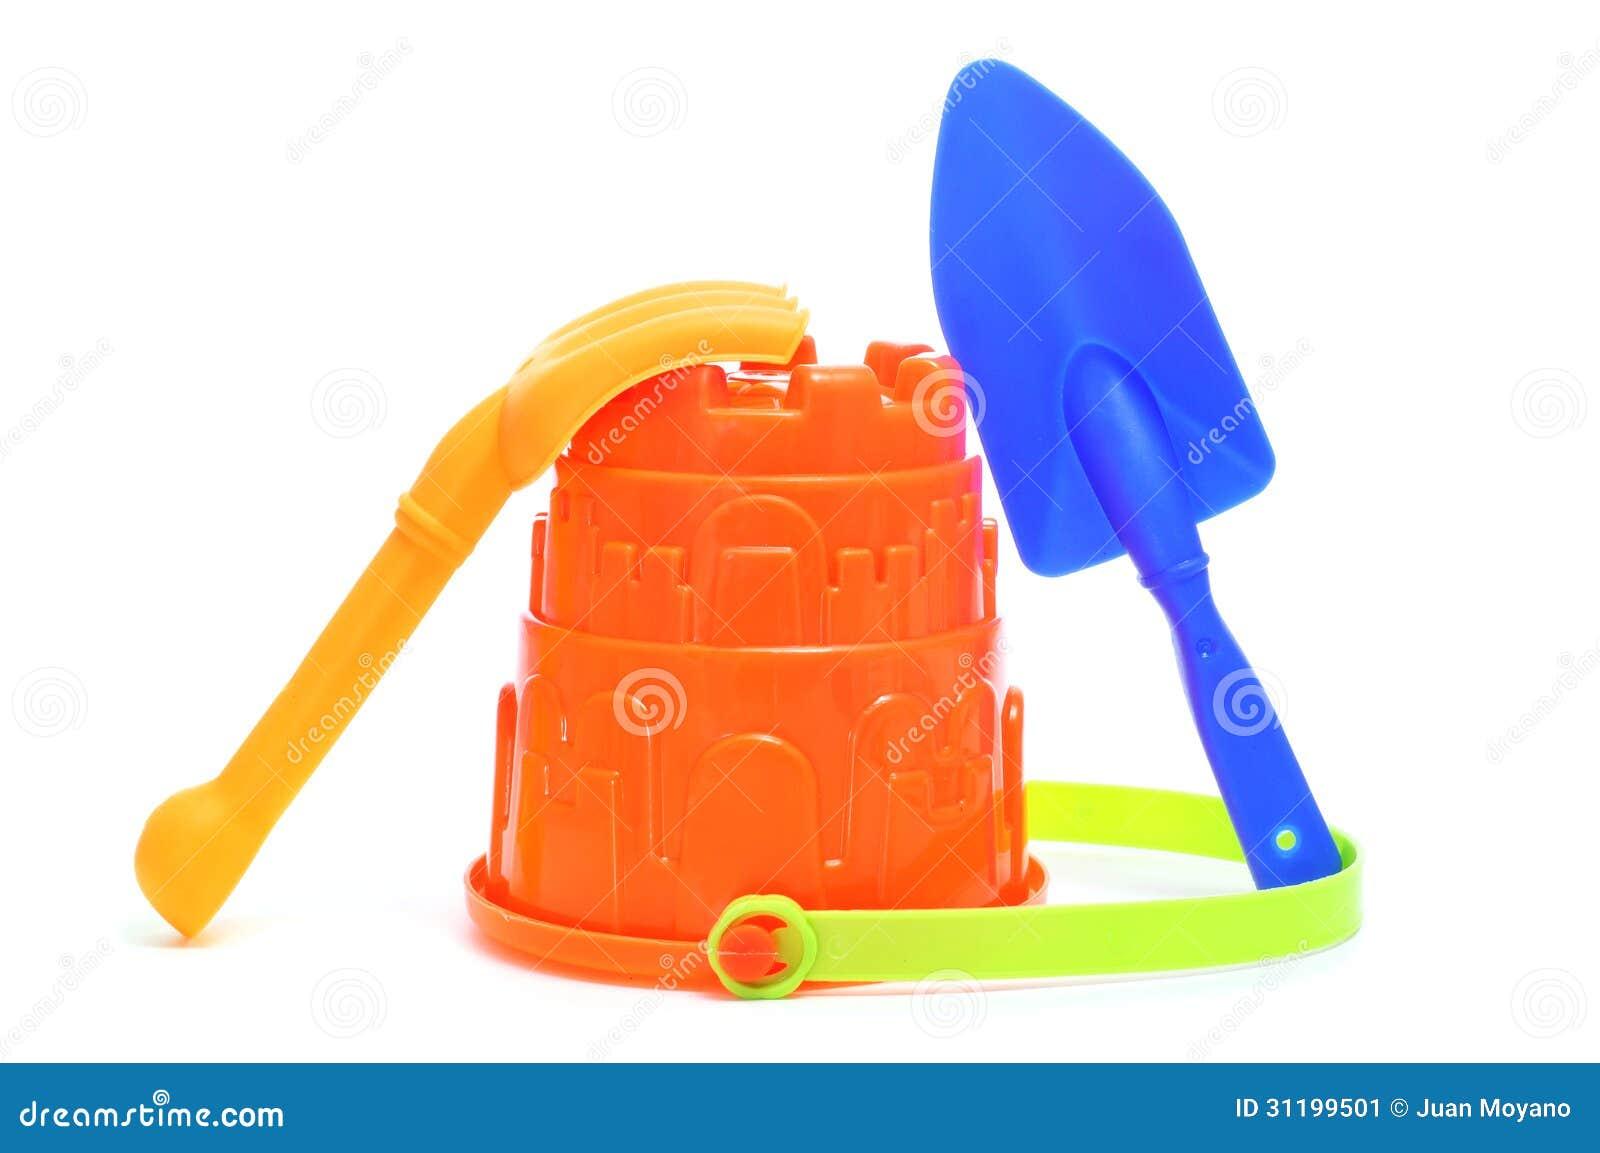 Sand / beach toy set: pail, shovel and rake